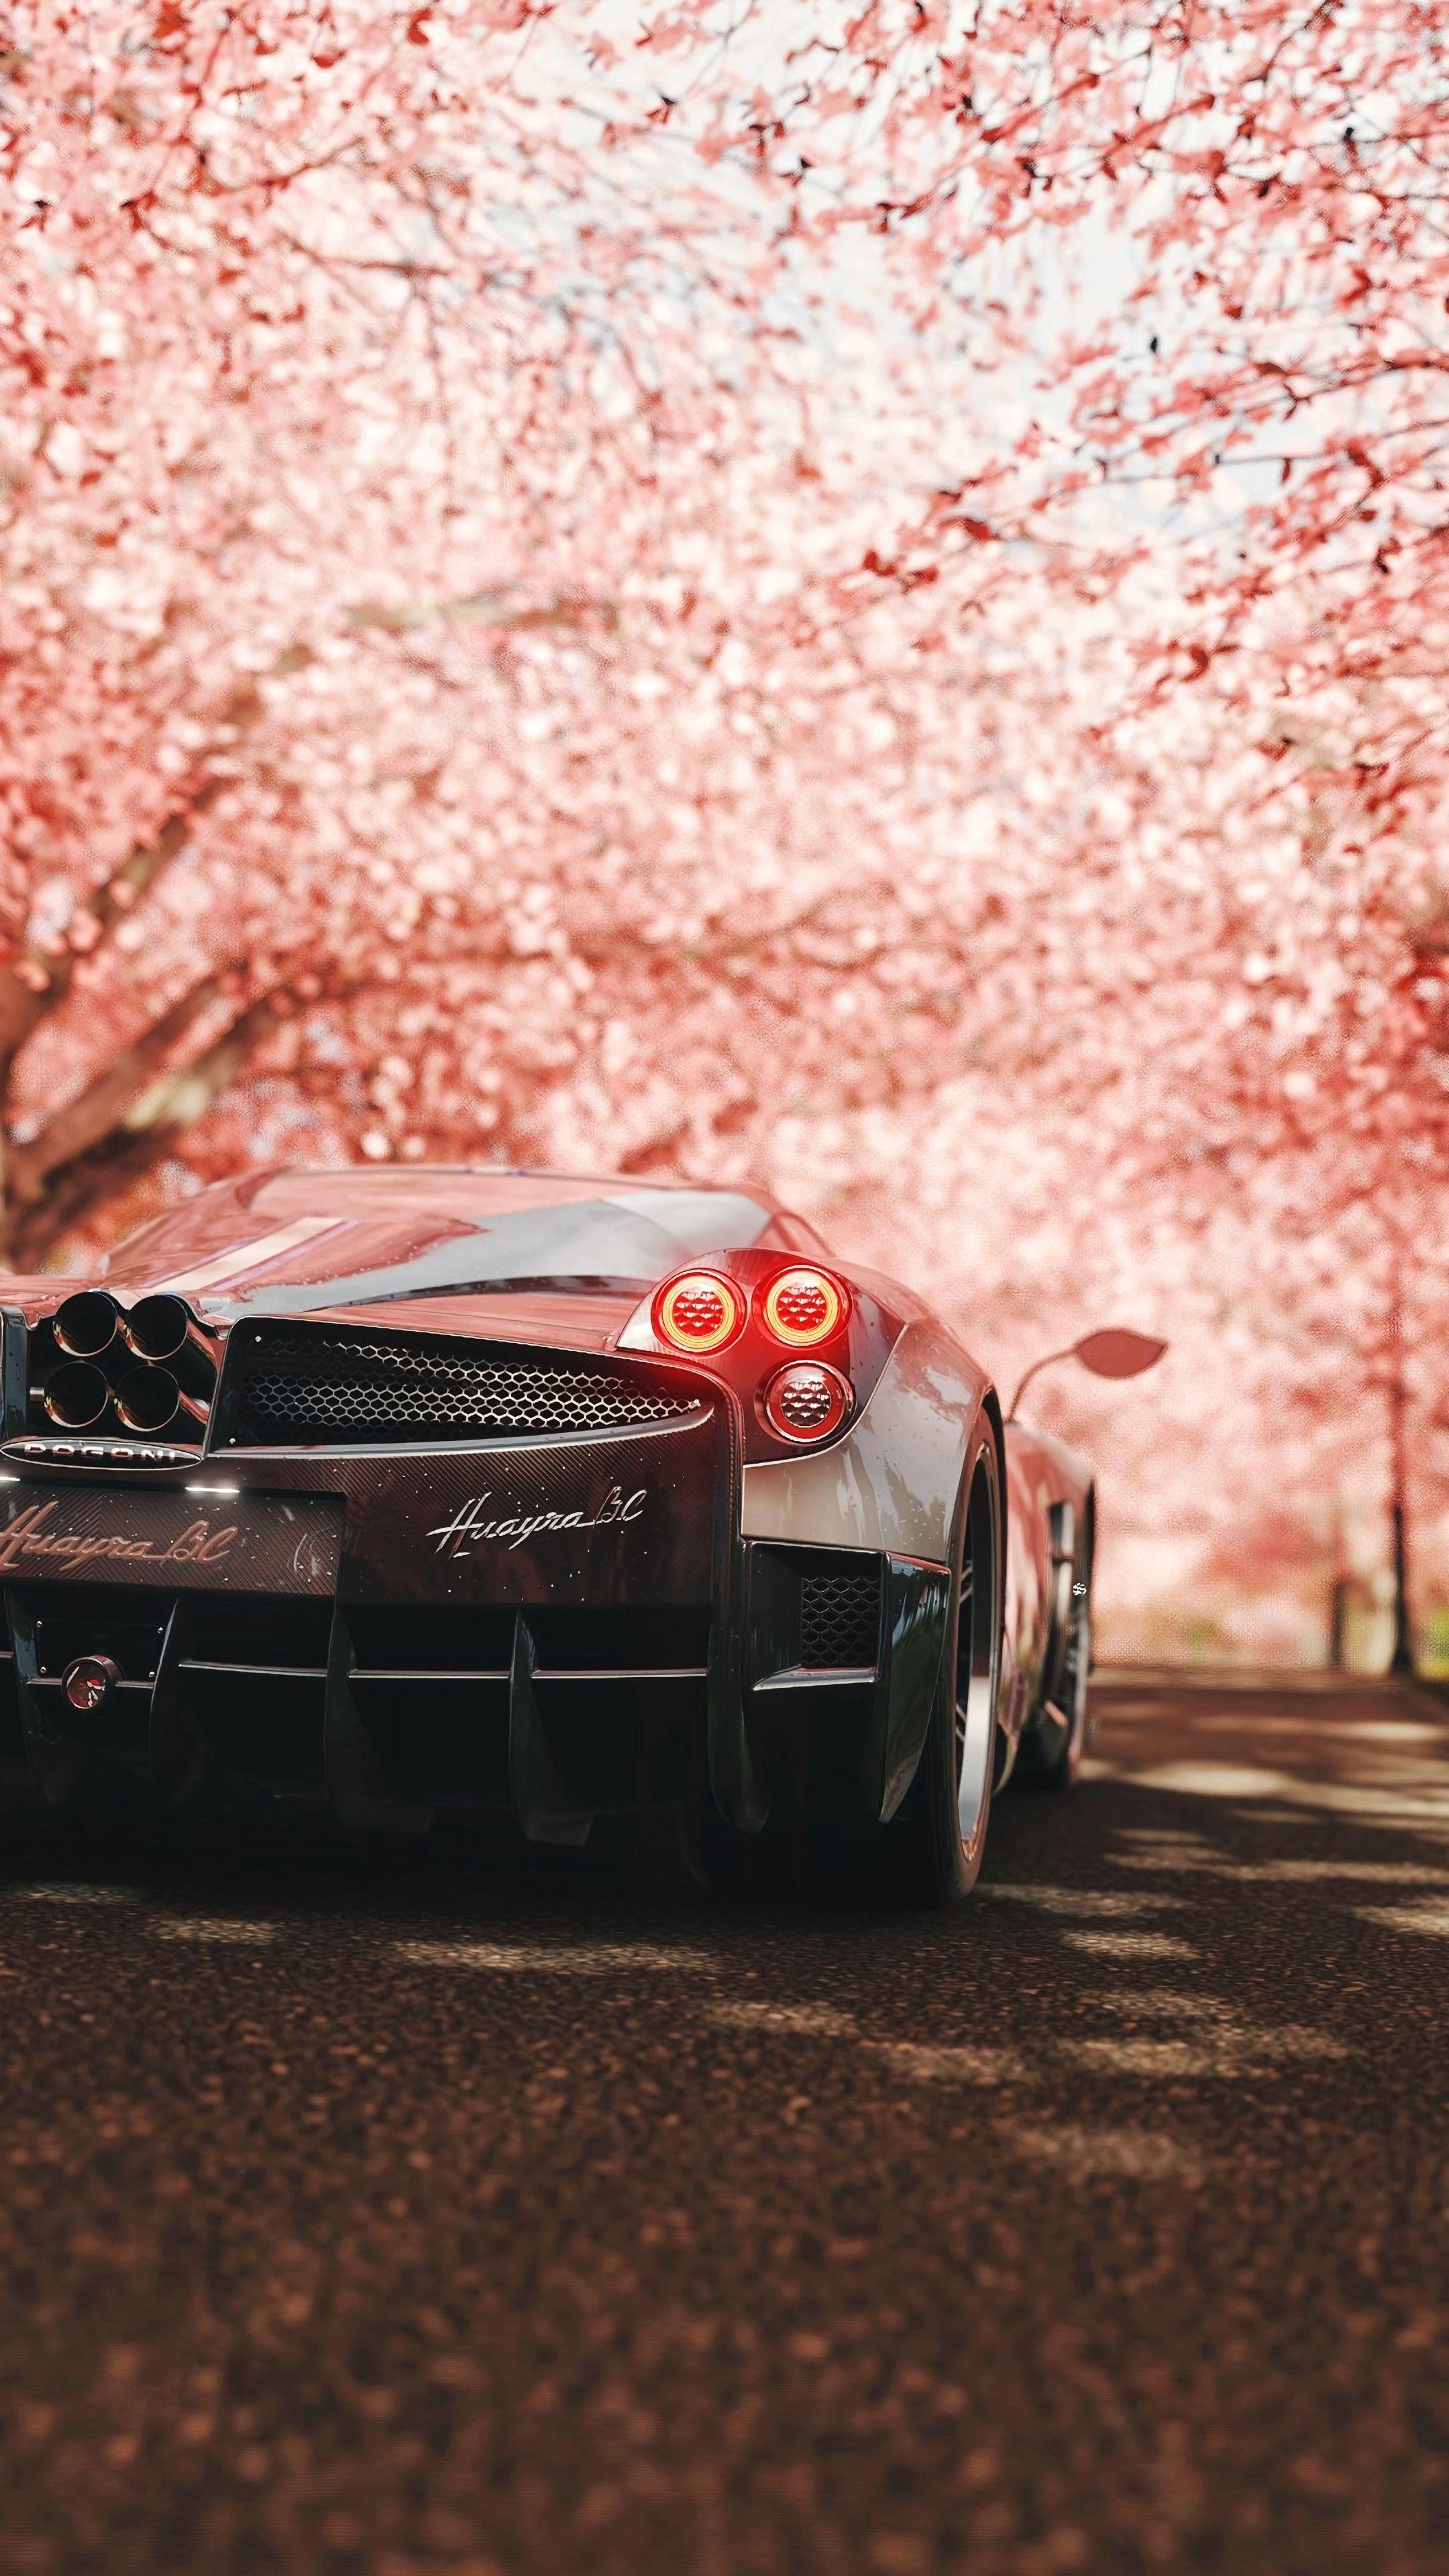 124723 Screensavers and Wallpapers Sakura for phone. Download Sports, Sakura, Pagani, Cars, Sports Car, Back View, Rear View, Supercar, Pagani Huayra pictures for free